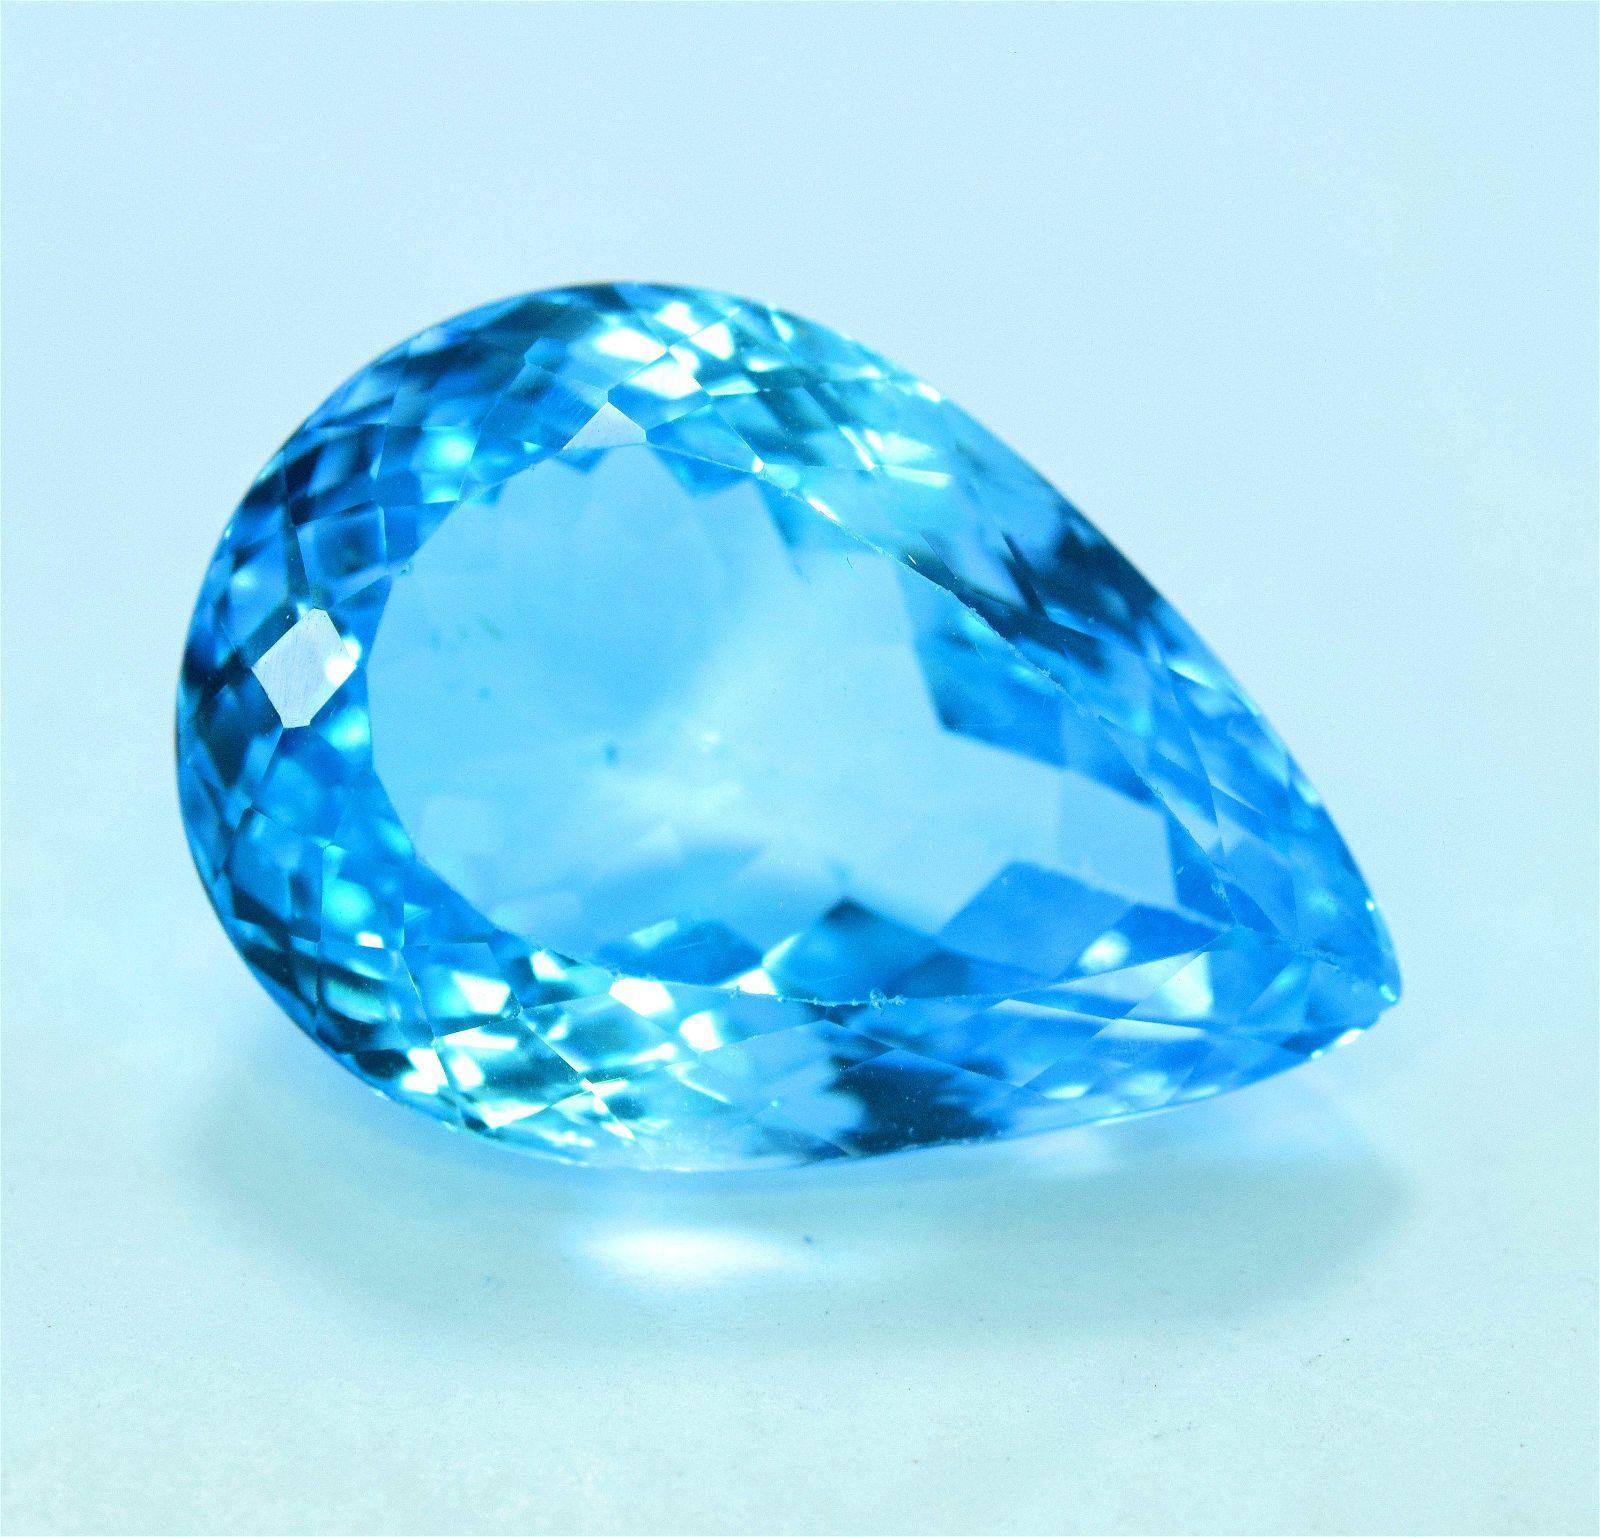 35.20 cts Stunning Electric Blue Topaz Gemstone -